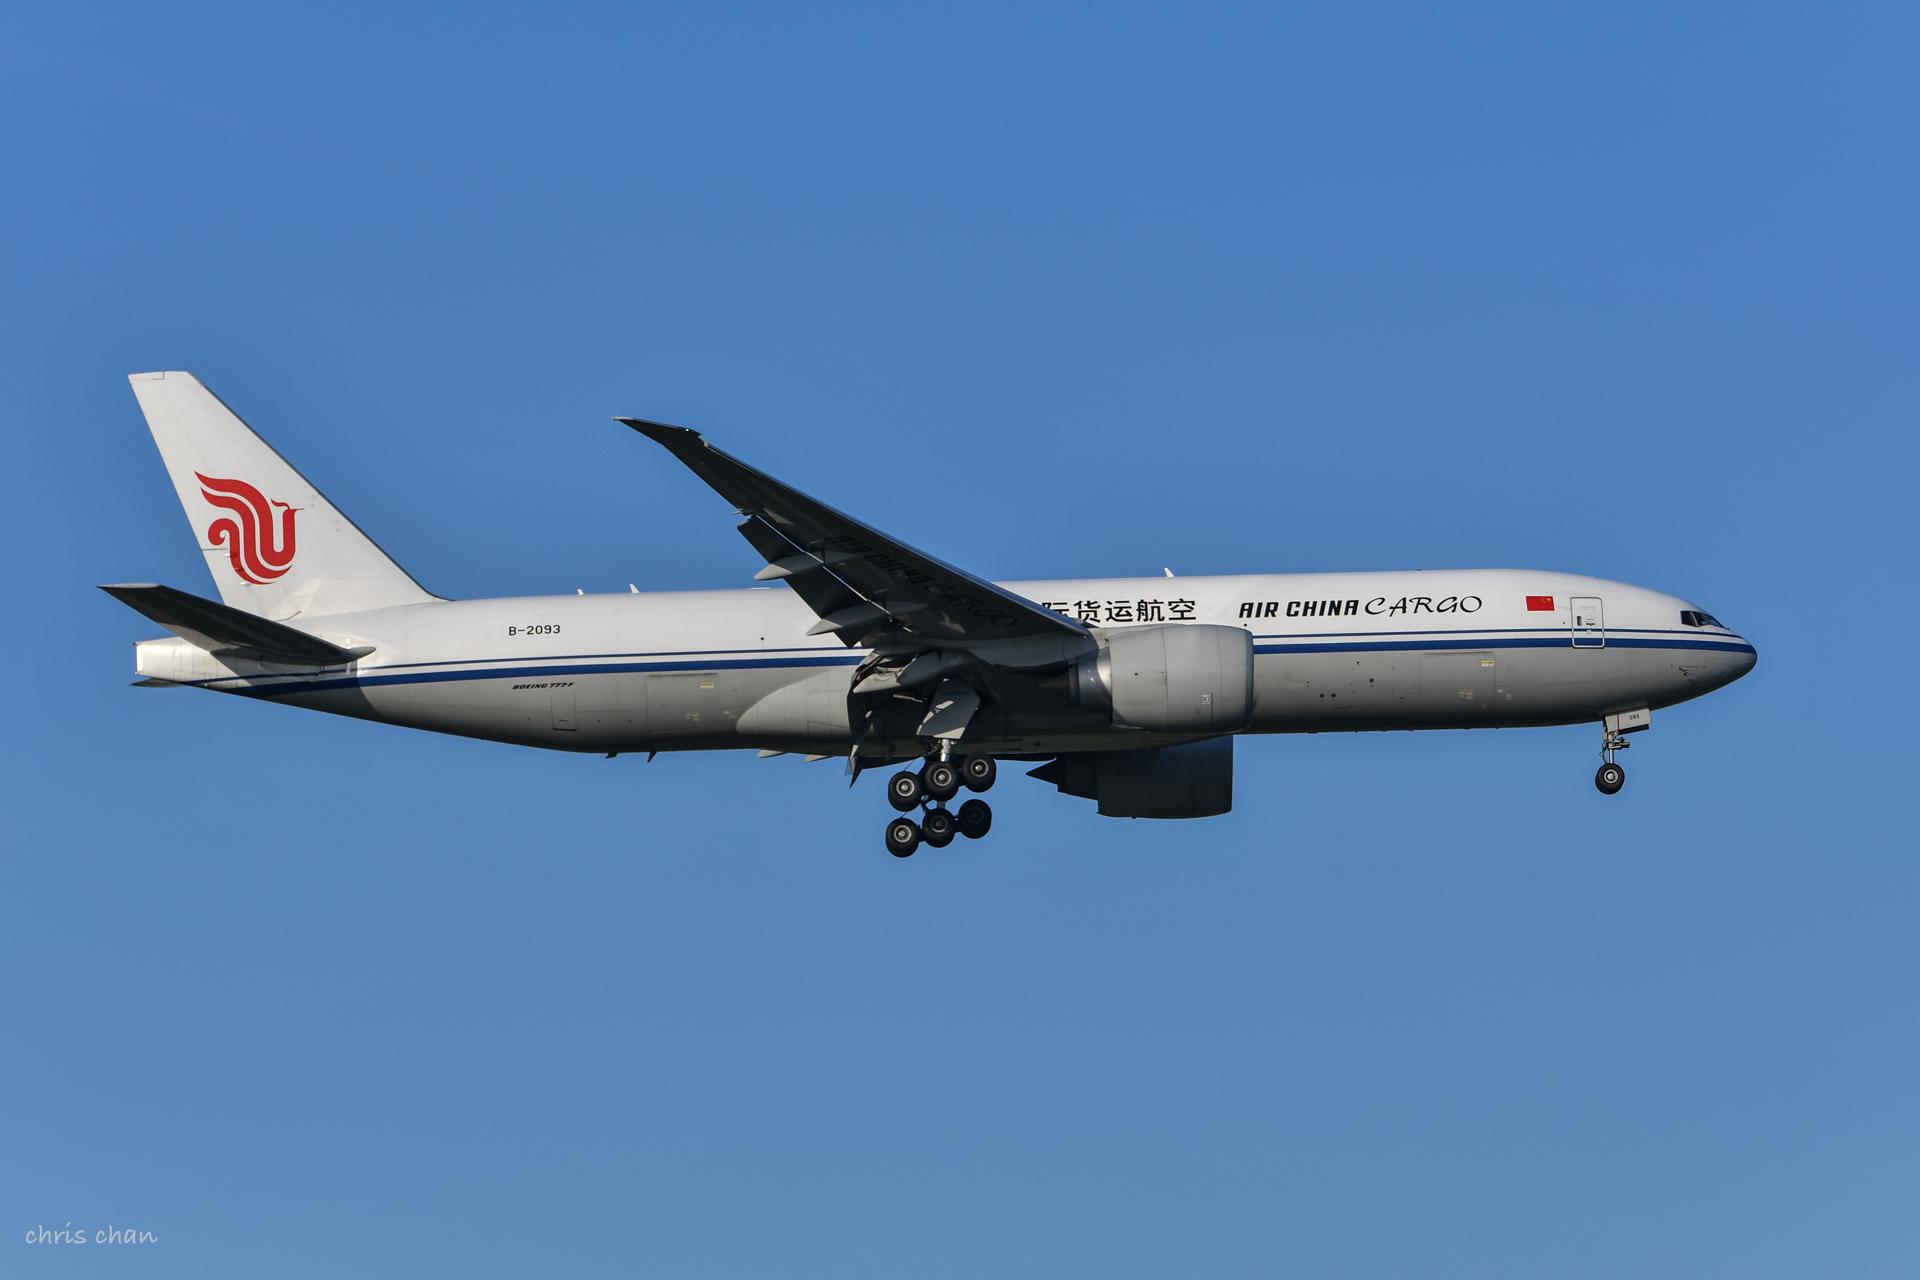 Re:[原创]新人报道——PVG首拍 BOEING 777-200 B-2093 中国上海浦东国际机场